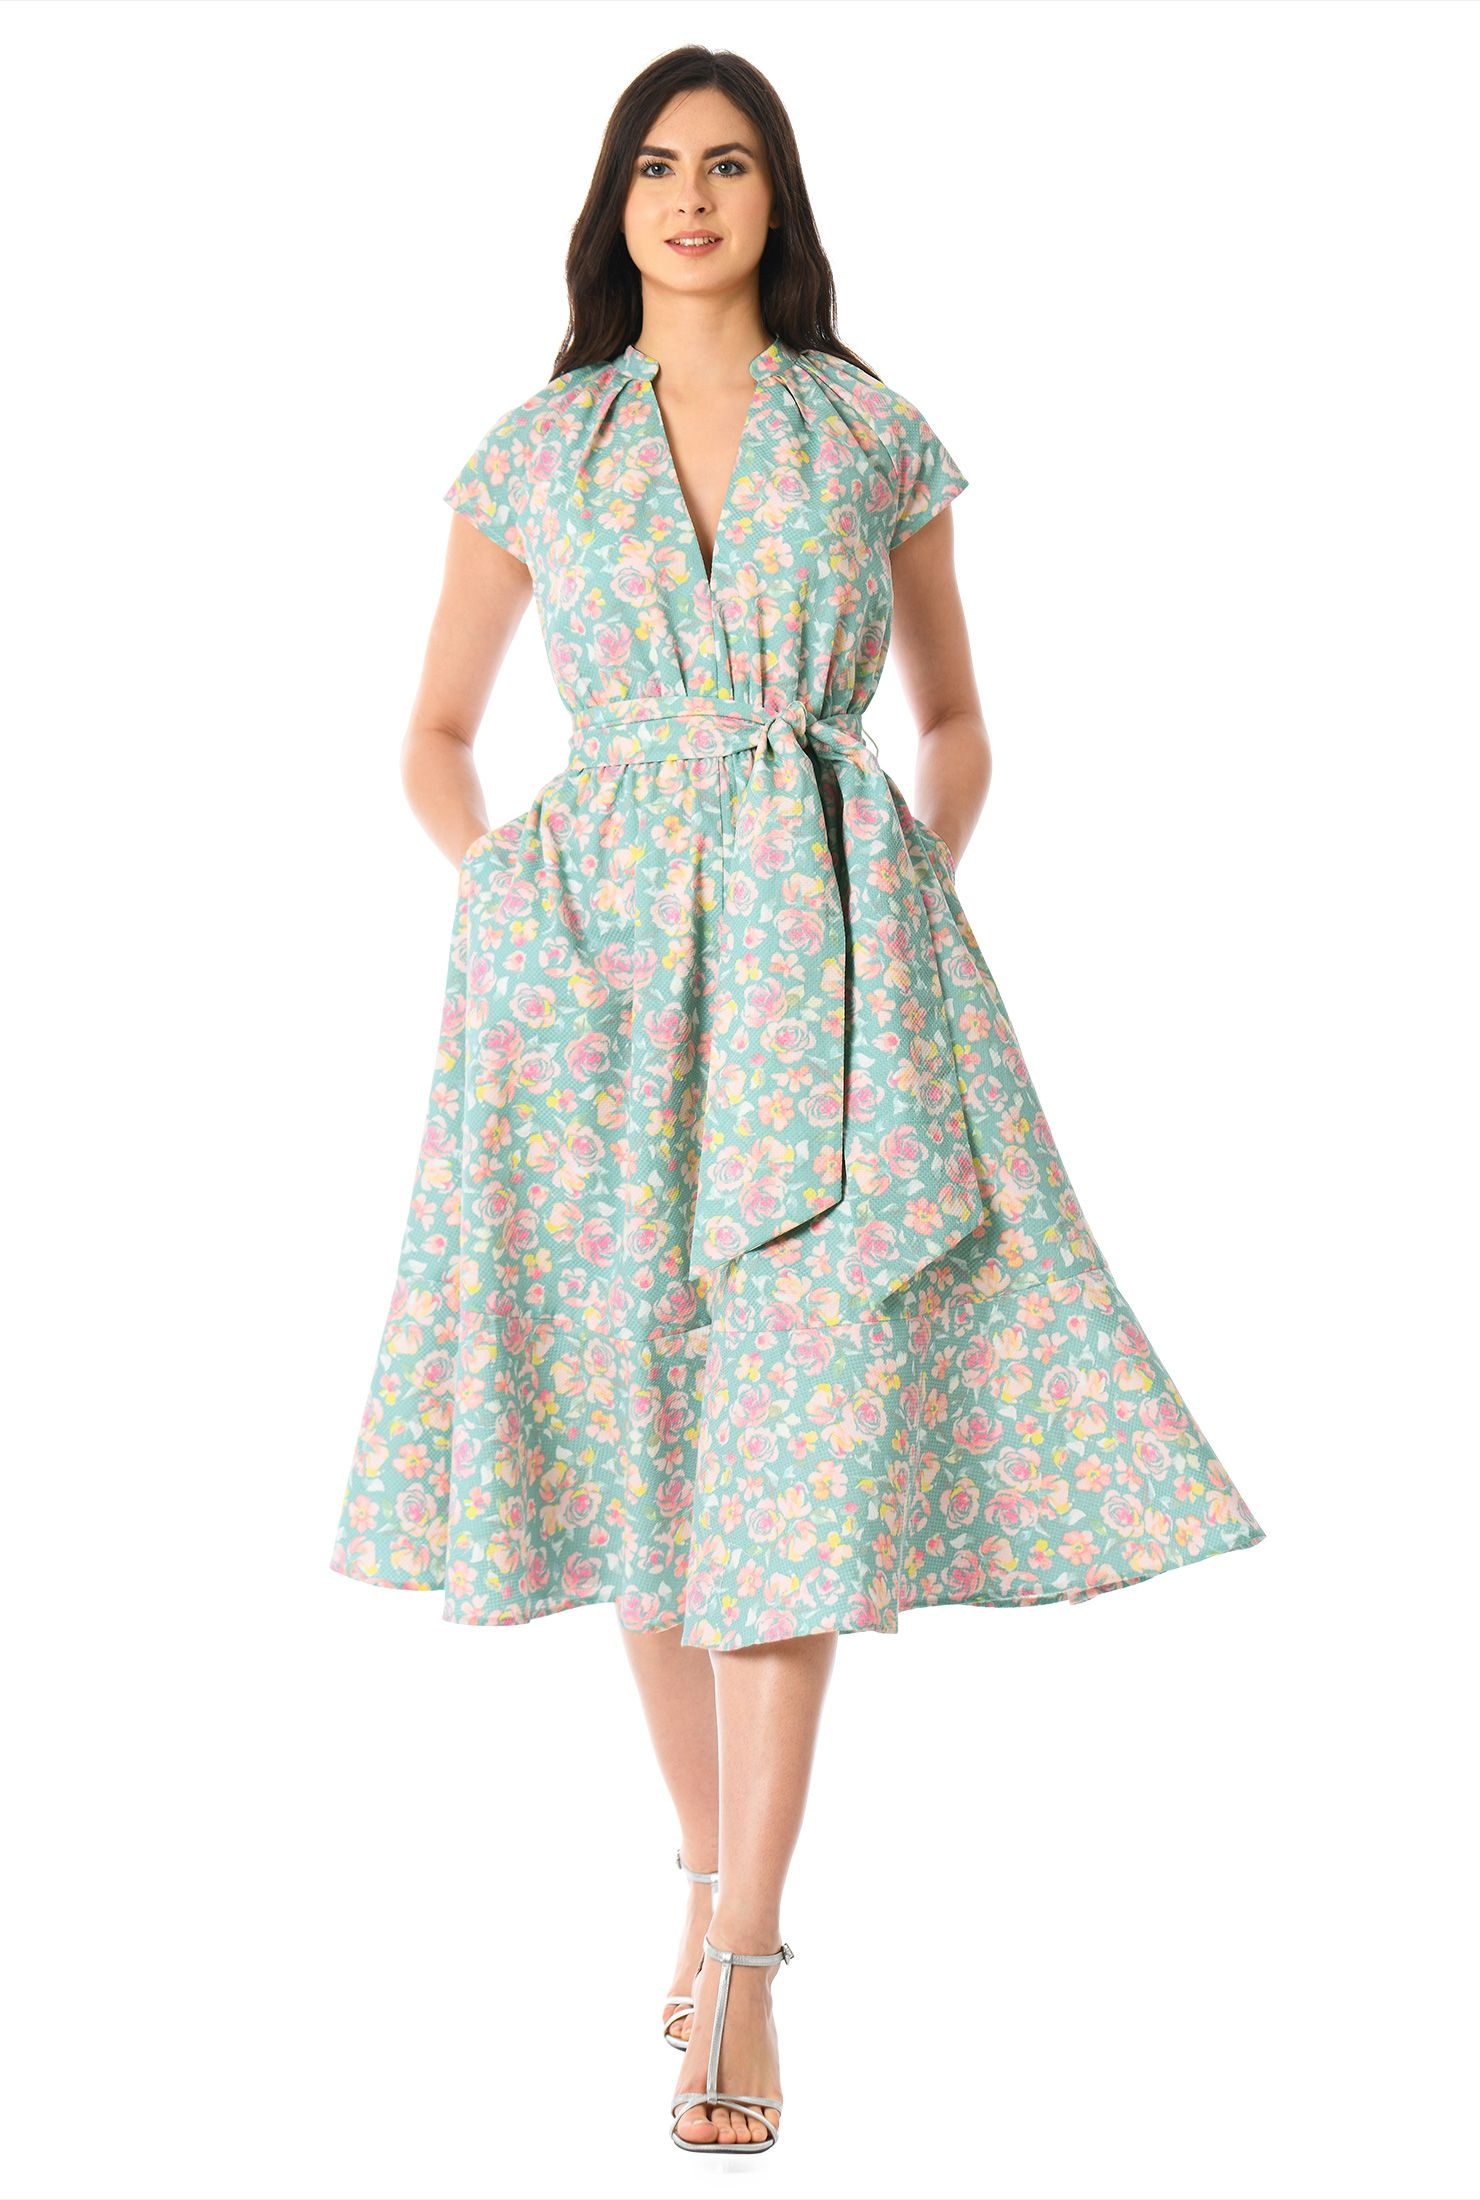 Wrap dresses at eshakti shop popular styles find wrap dresses